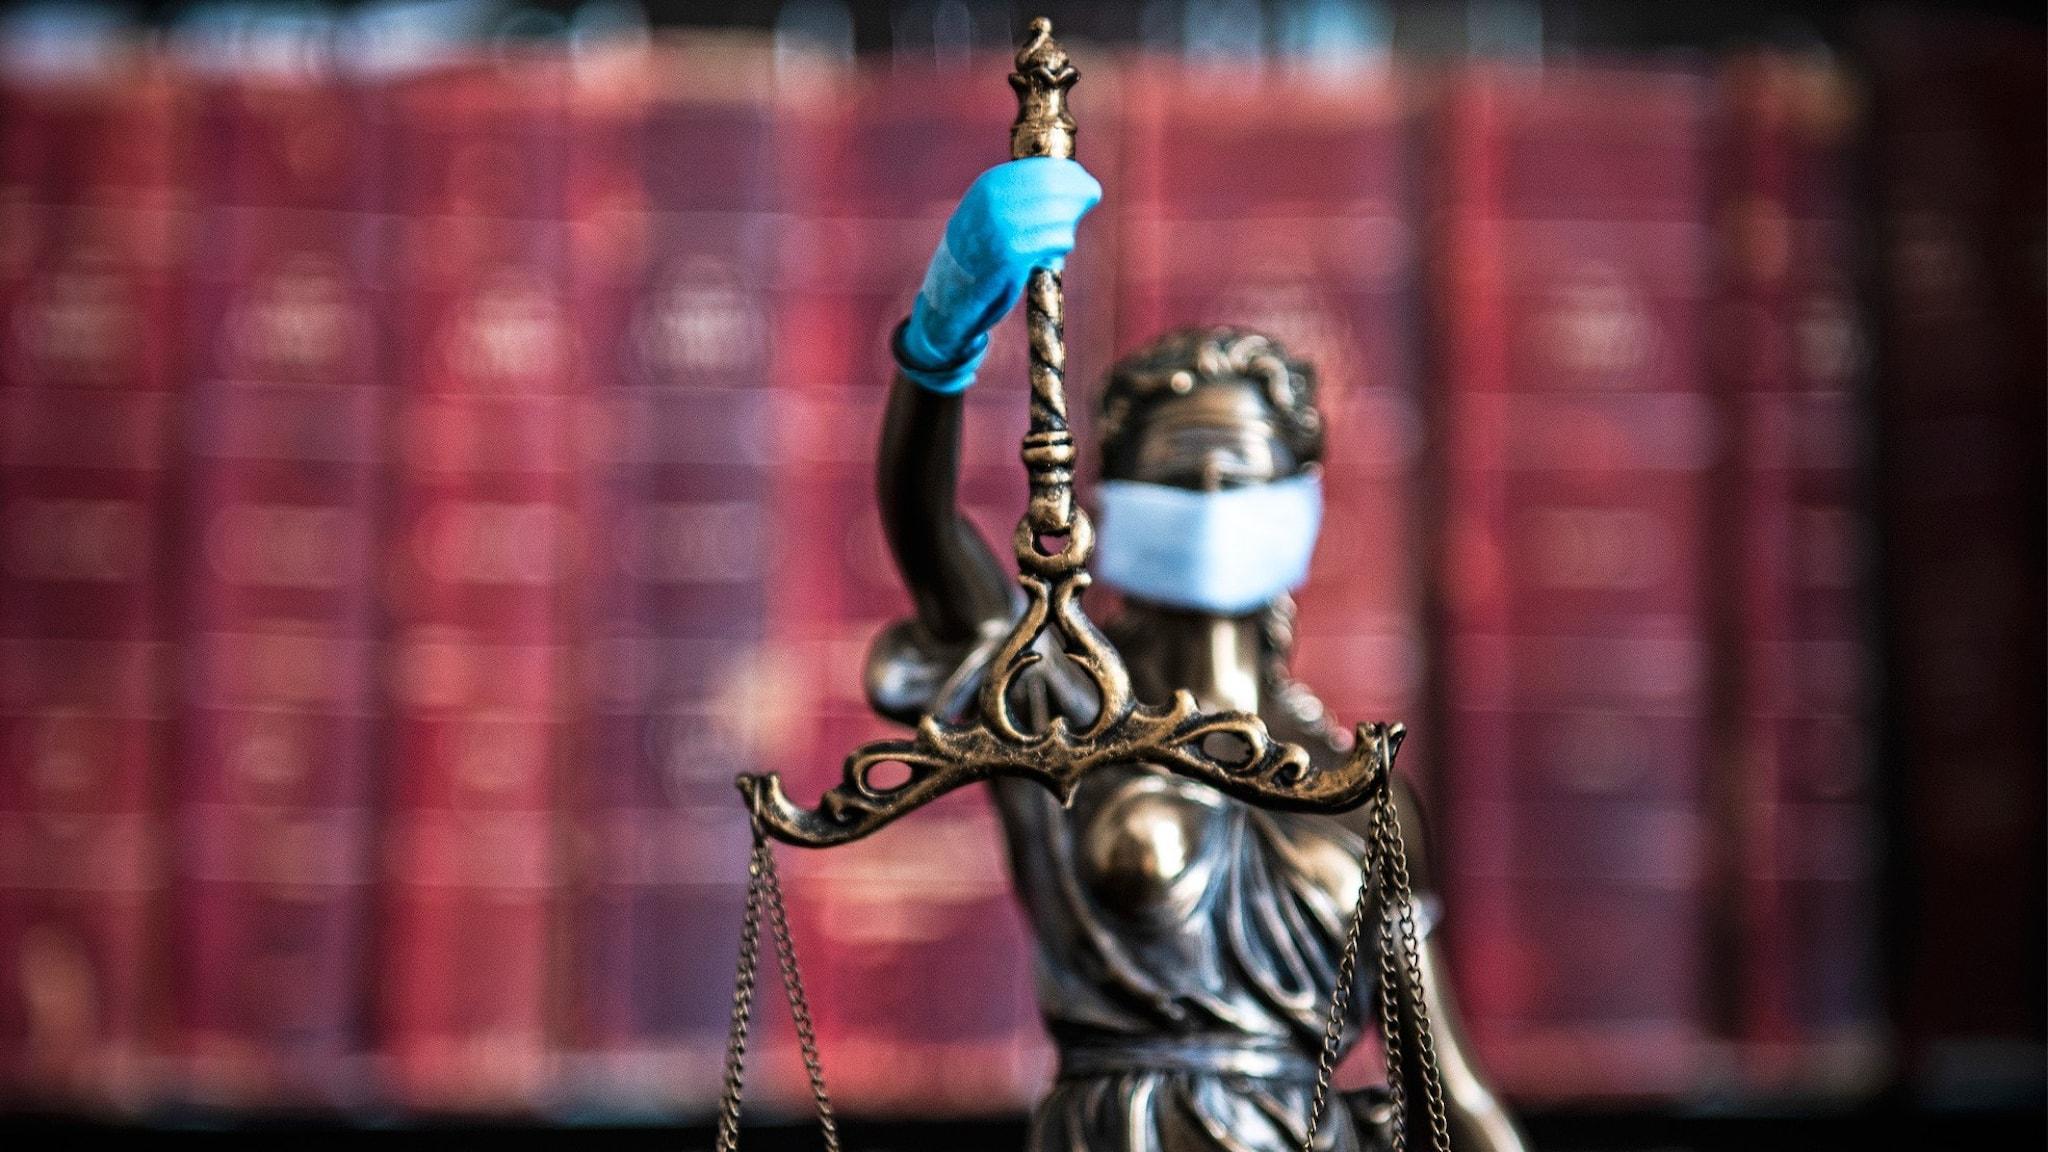 Justitia med munkavel